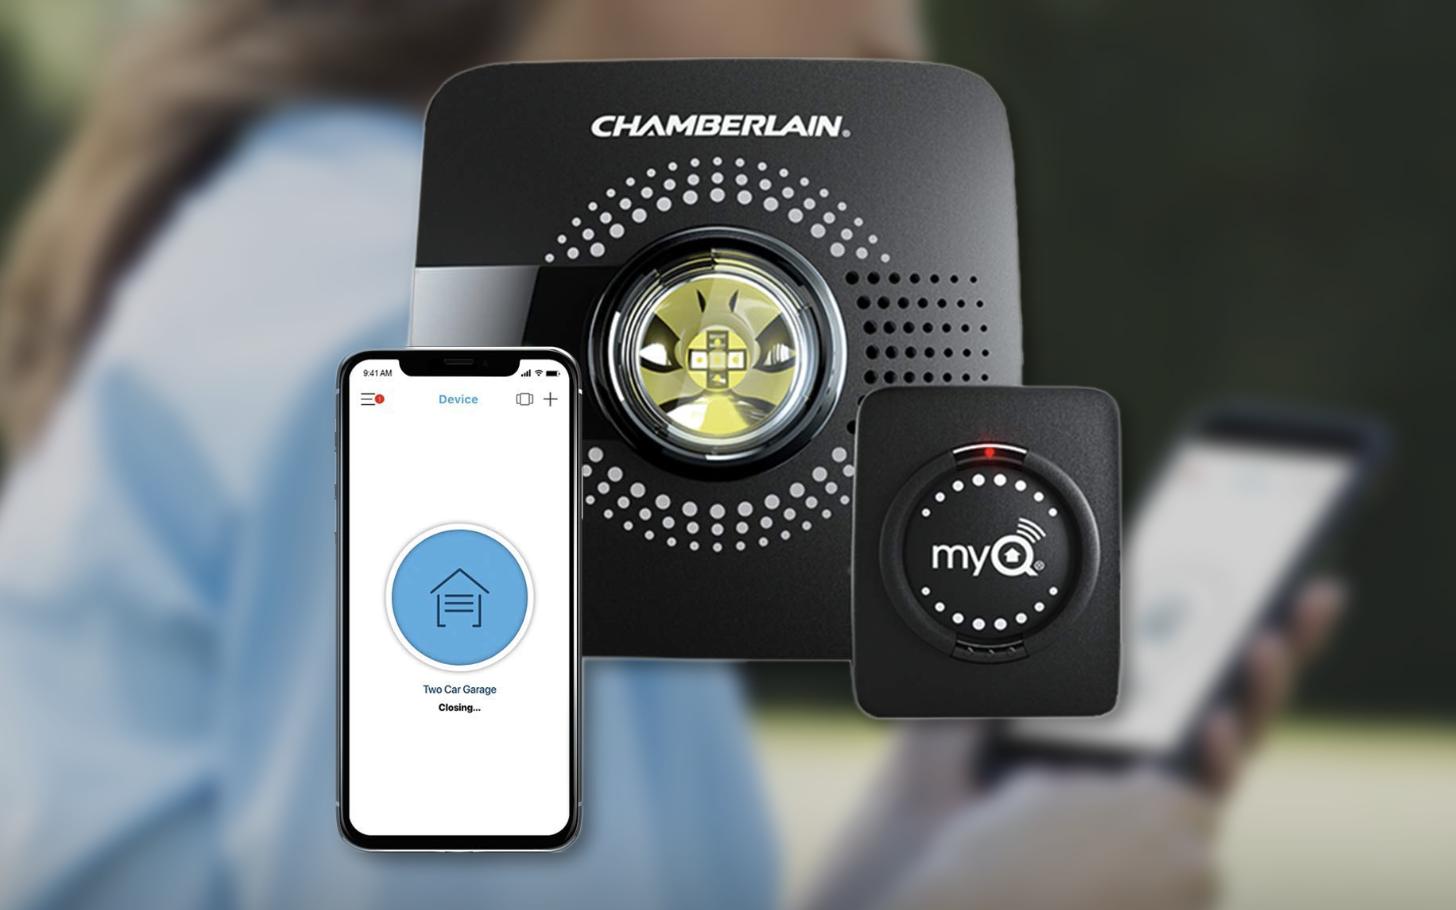 Flipboard The Chamberlain Myq Smart Garage Hub Is On Sale